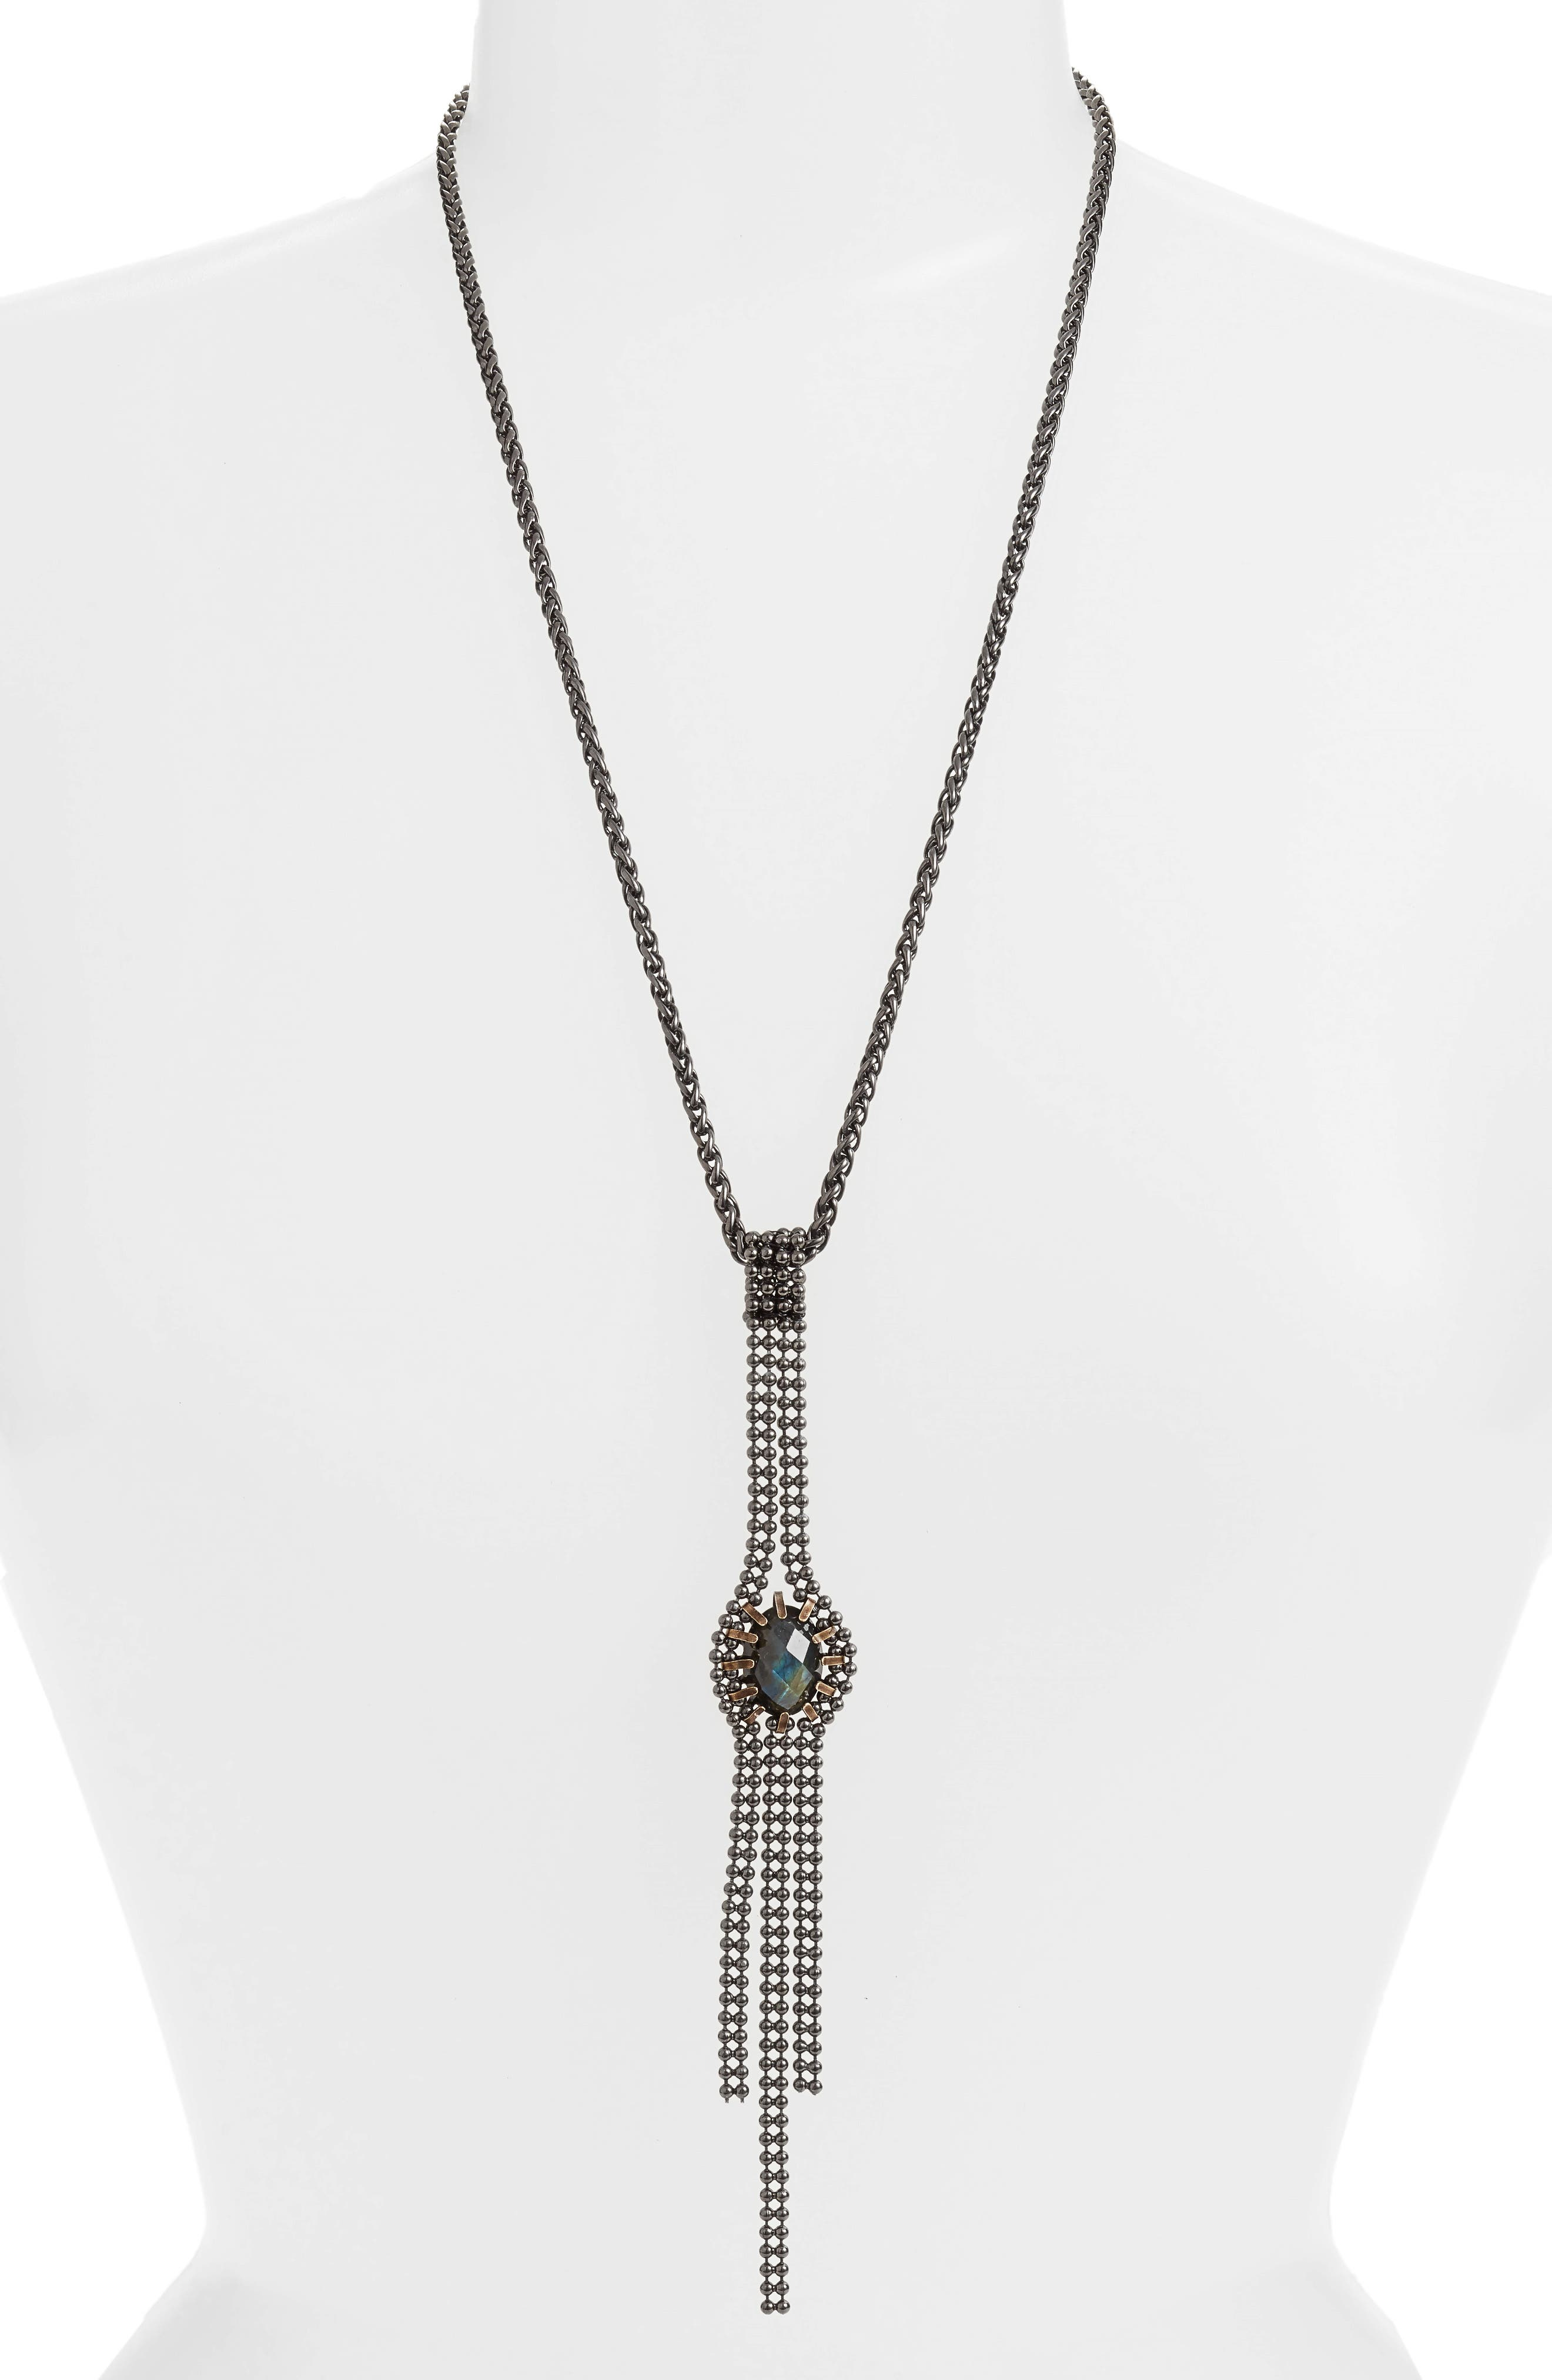 Labradorite Pendant Necklace,                         Main,                         color, Blue/ Green/ Gunmetal